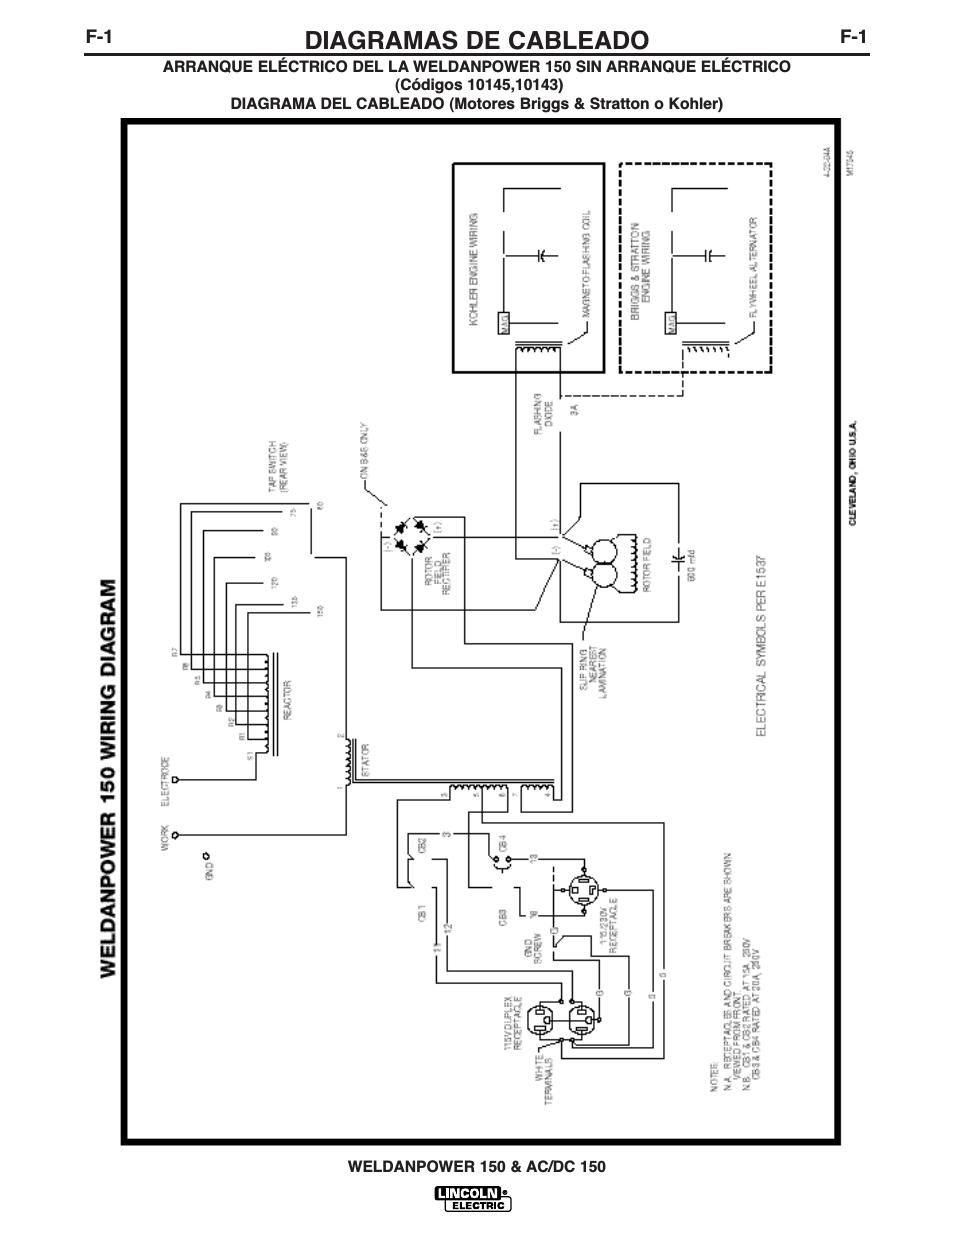 ok_5864] lincoln ac 225 welder wiring diagram download diagram  dome bemua kapemie mohammedshrine librar wiring 101